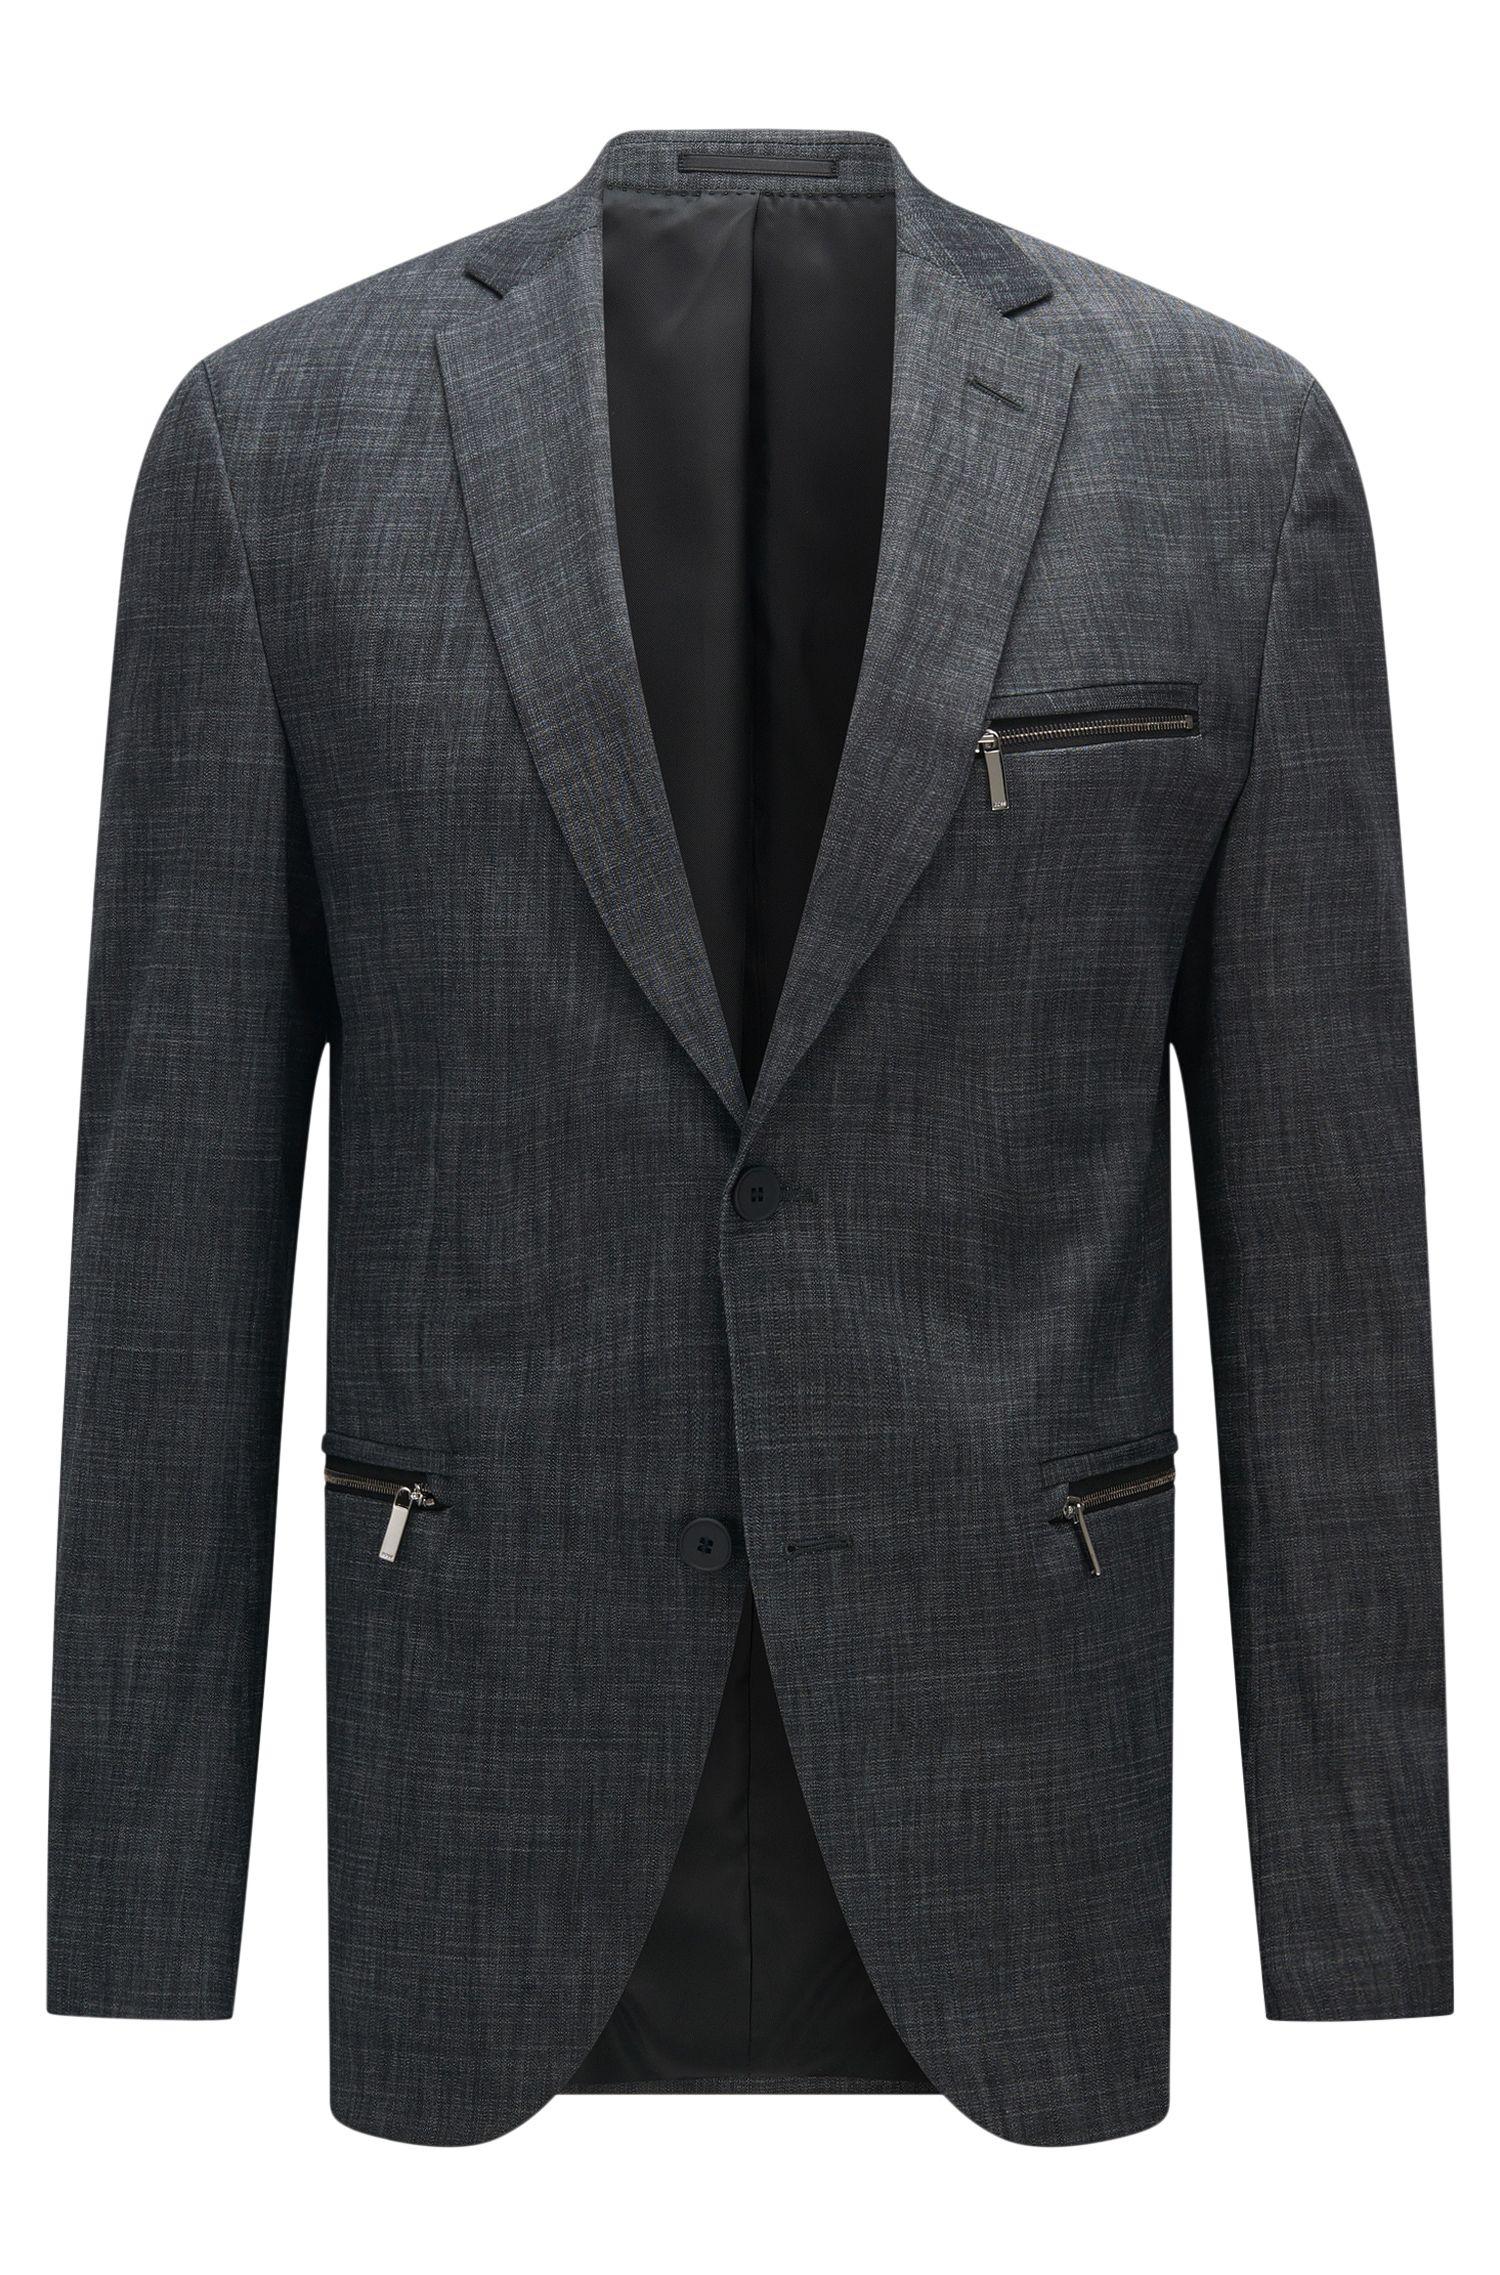 Stretch Cotton Blend Patterned Blazer, Extra Slim Fit | Ronen